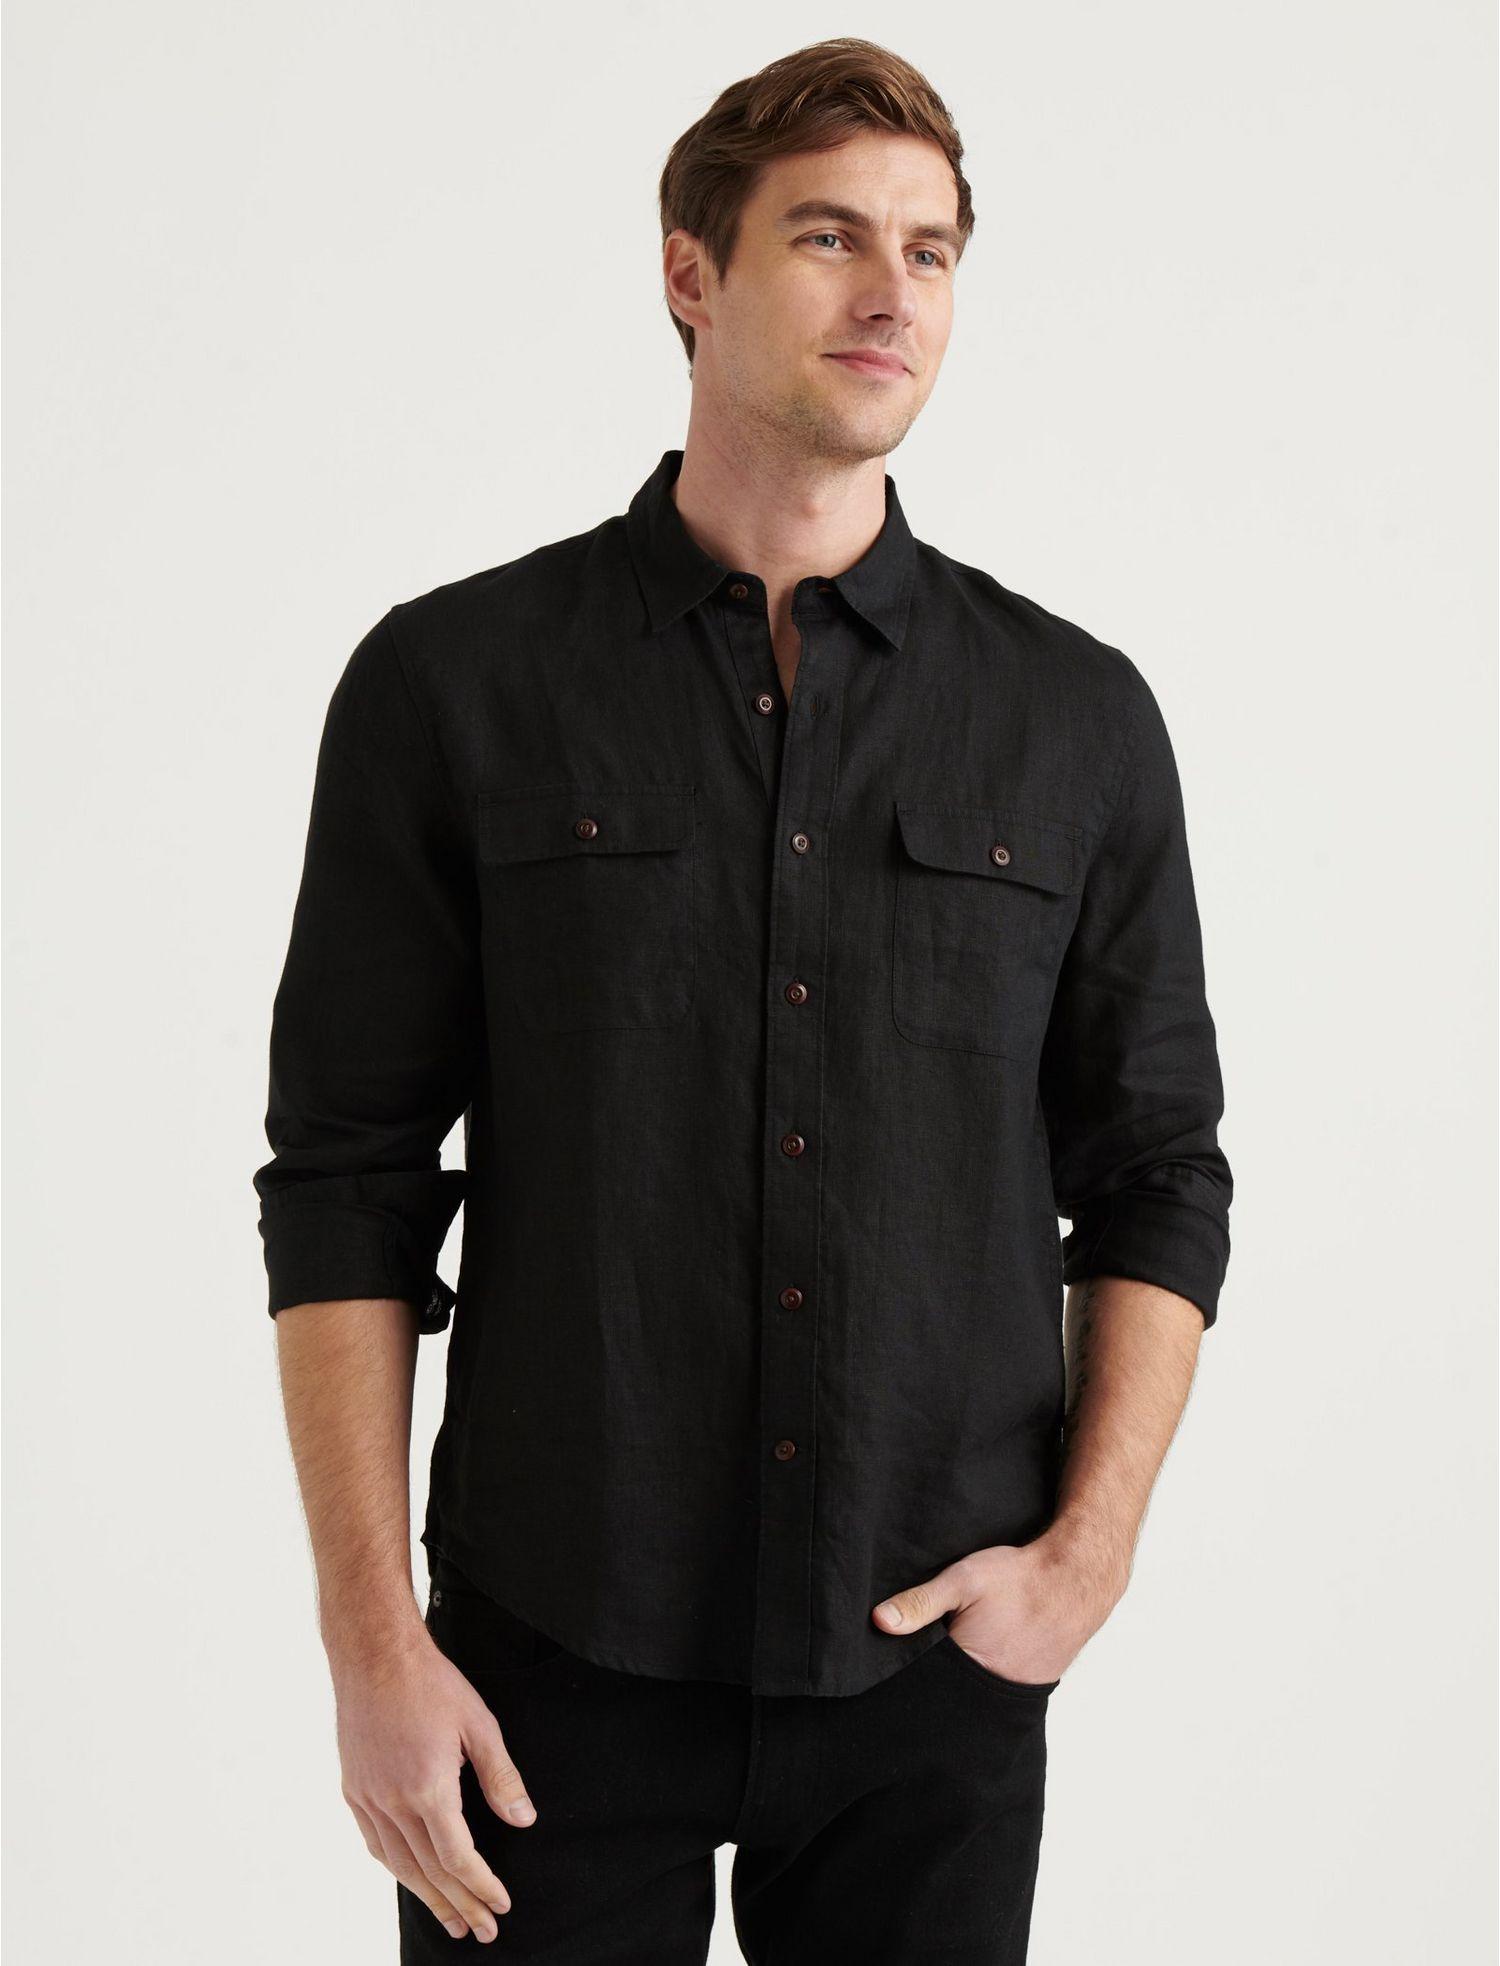 Men's Vintage Workwear – 1920s, 1930s, 1940s, 1950s Lucky Brand Linen Humboldt Workwear Shirt In Black Size Small $35.00 AT vintagedancer.com